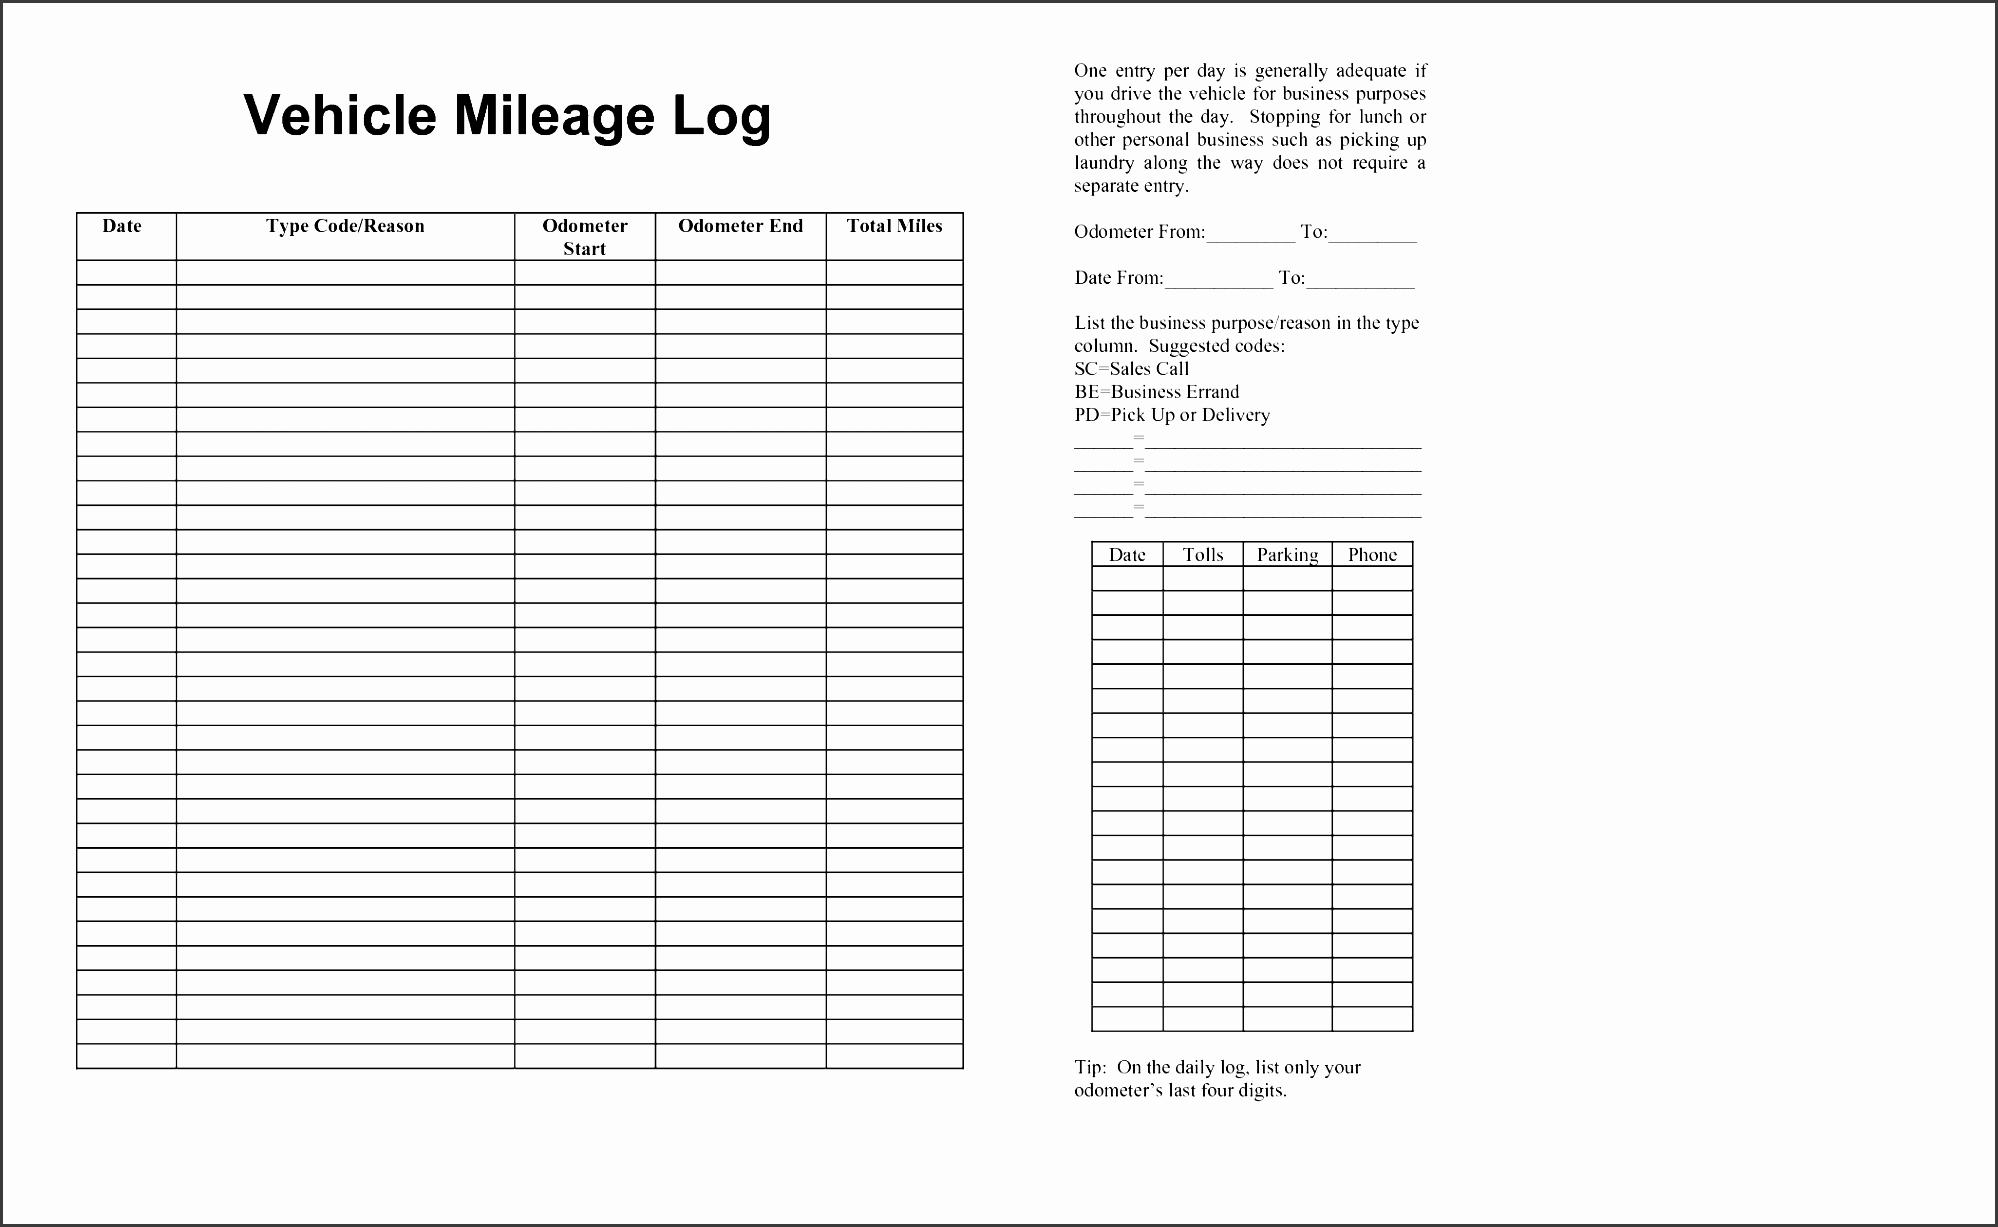 Mileage Spreadsheet For Taxes Lovely Car Mileage Spreadsheet Luxury Car Mileage Spreadsheet New Gas